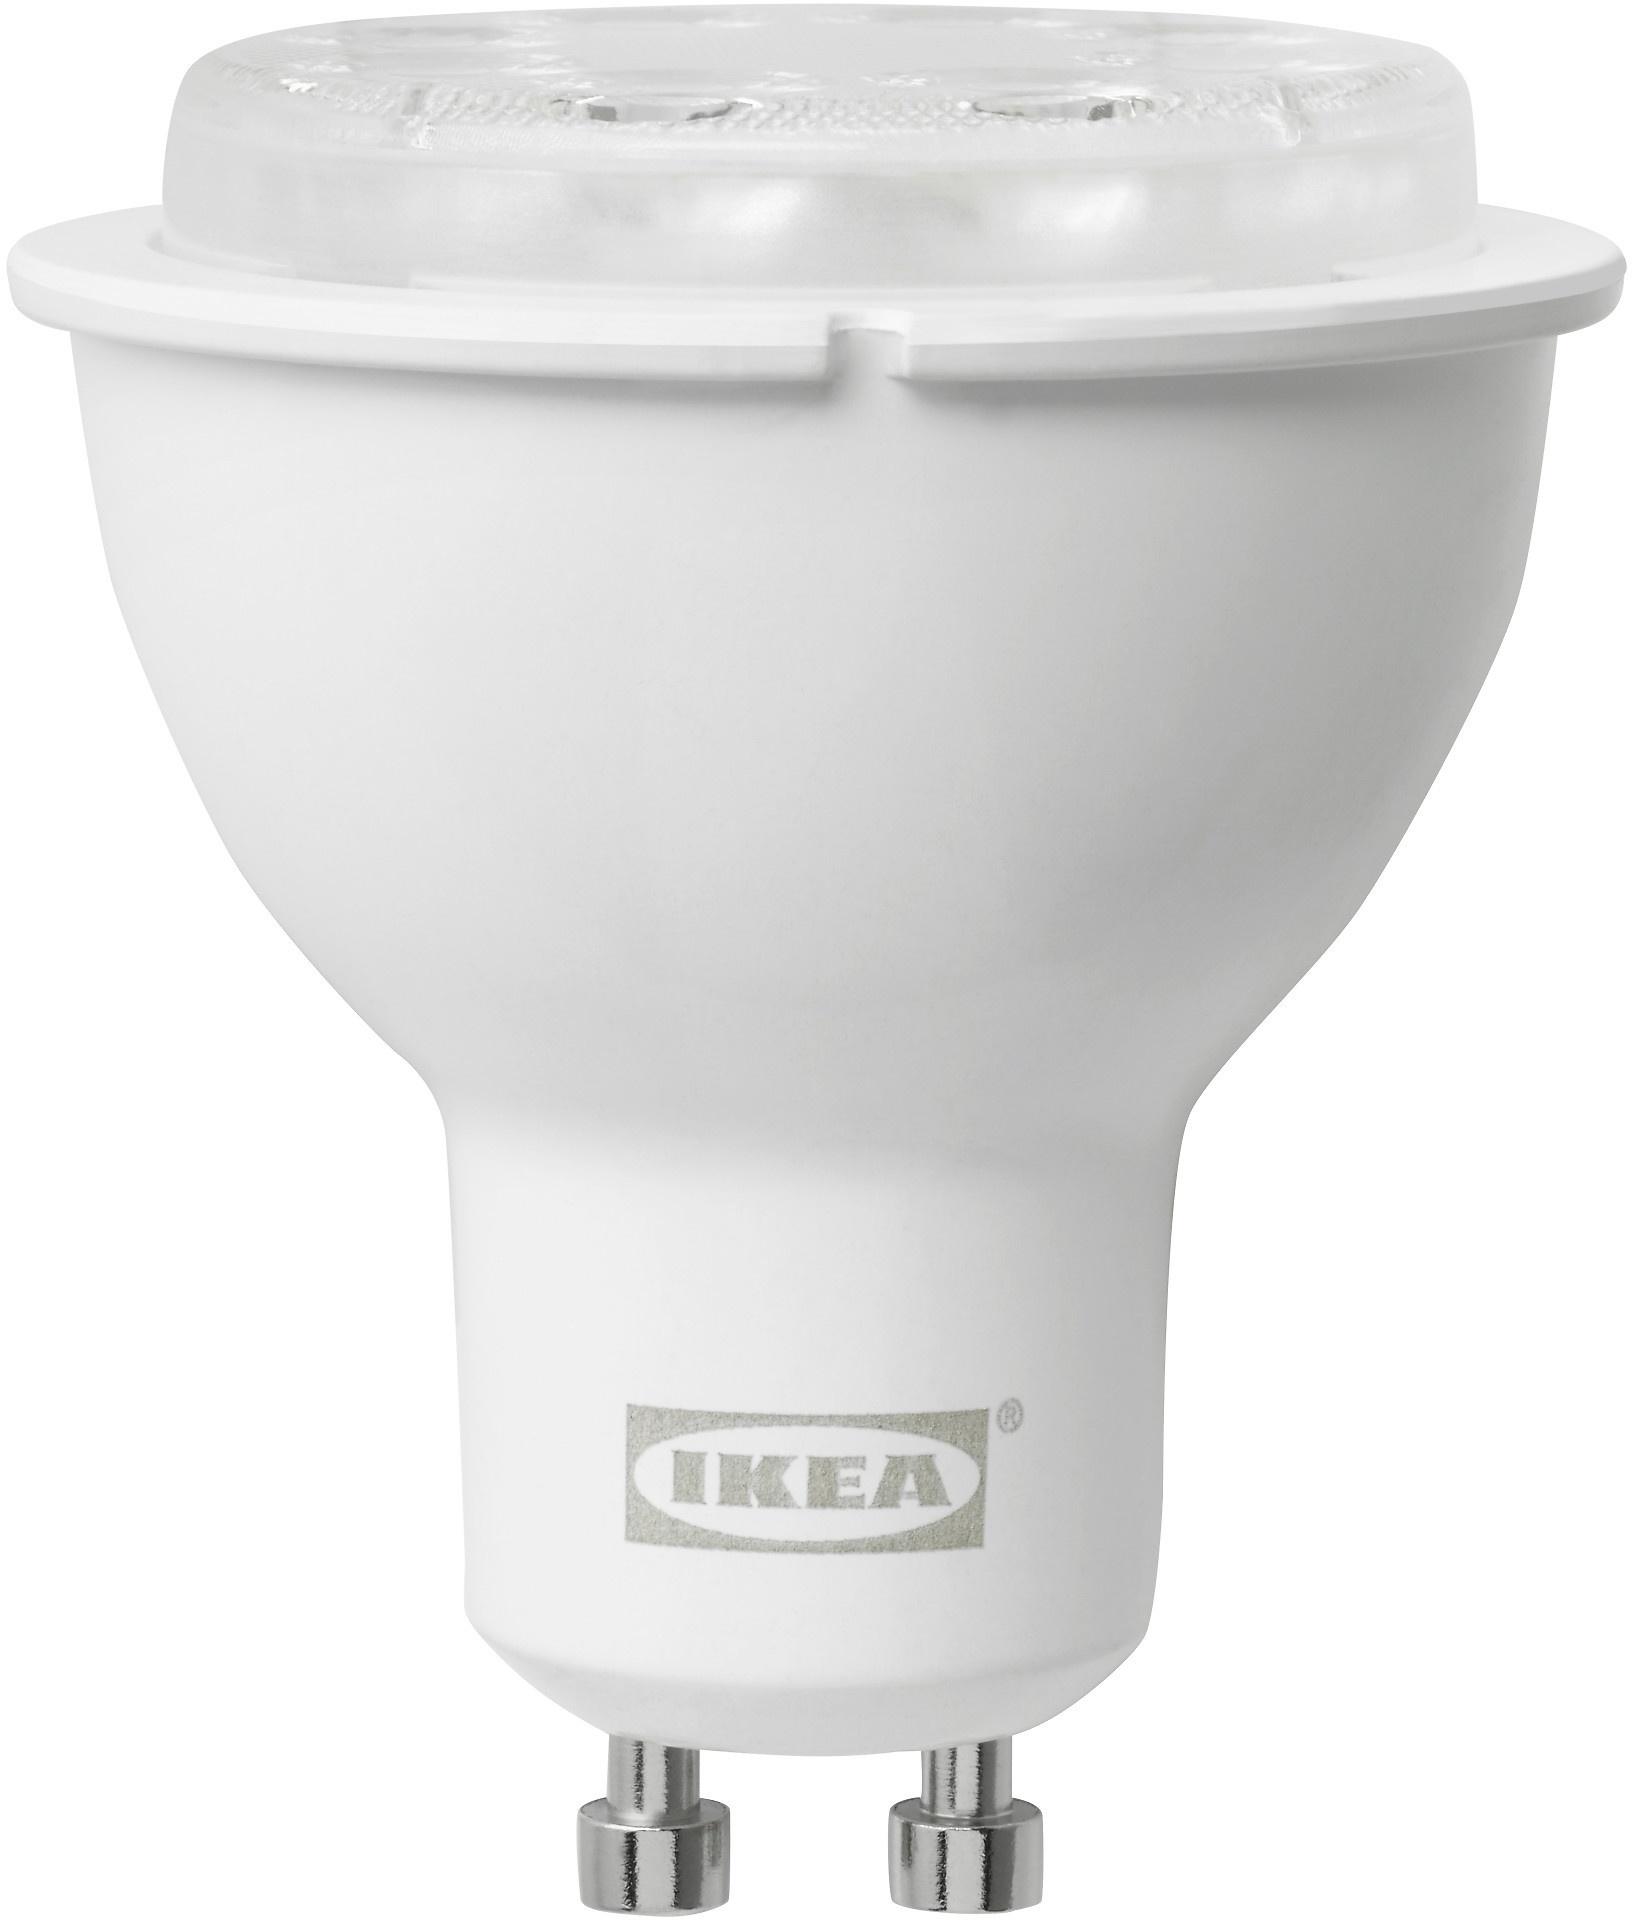 Gu10 Led Dimbaar.Ikea Tradfri Led Lamp Gu10 400 Lumen Draadloos Dimbaar Wit Spectrum